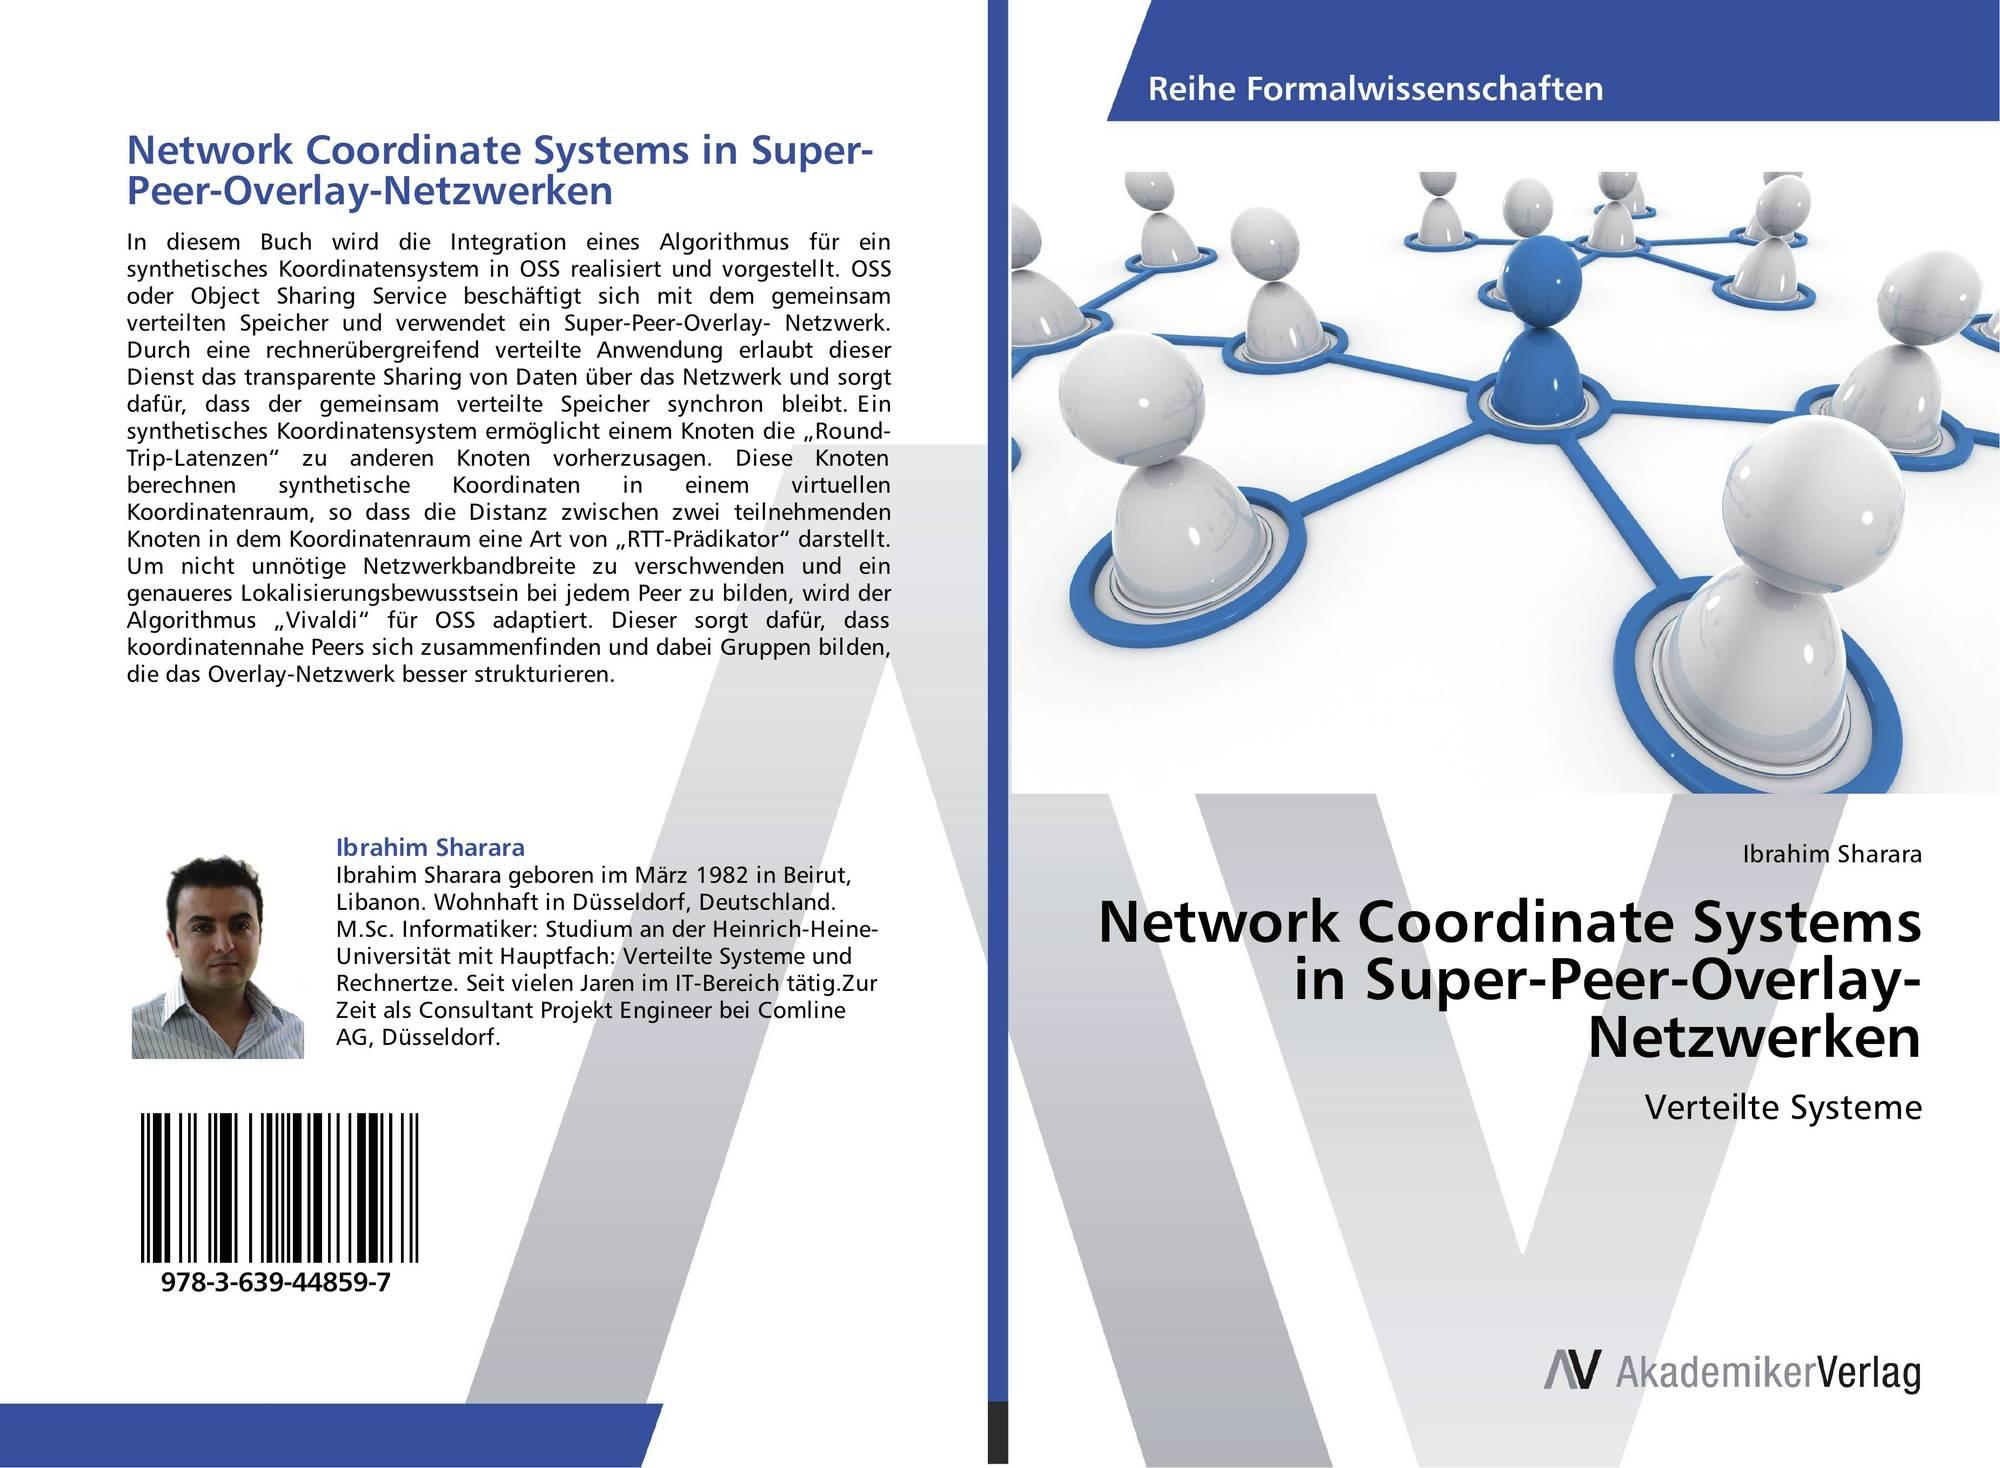 network coordinate systems in super peer overlay netzwerken 978 3 639 44859 7 3639448596. Black Bedroom Furniture Sets. Home Design Ideas